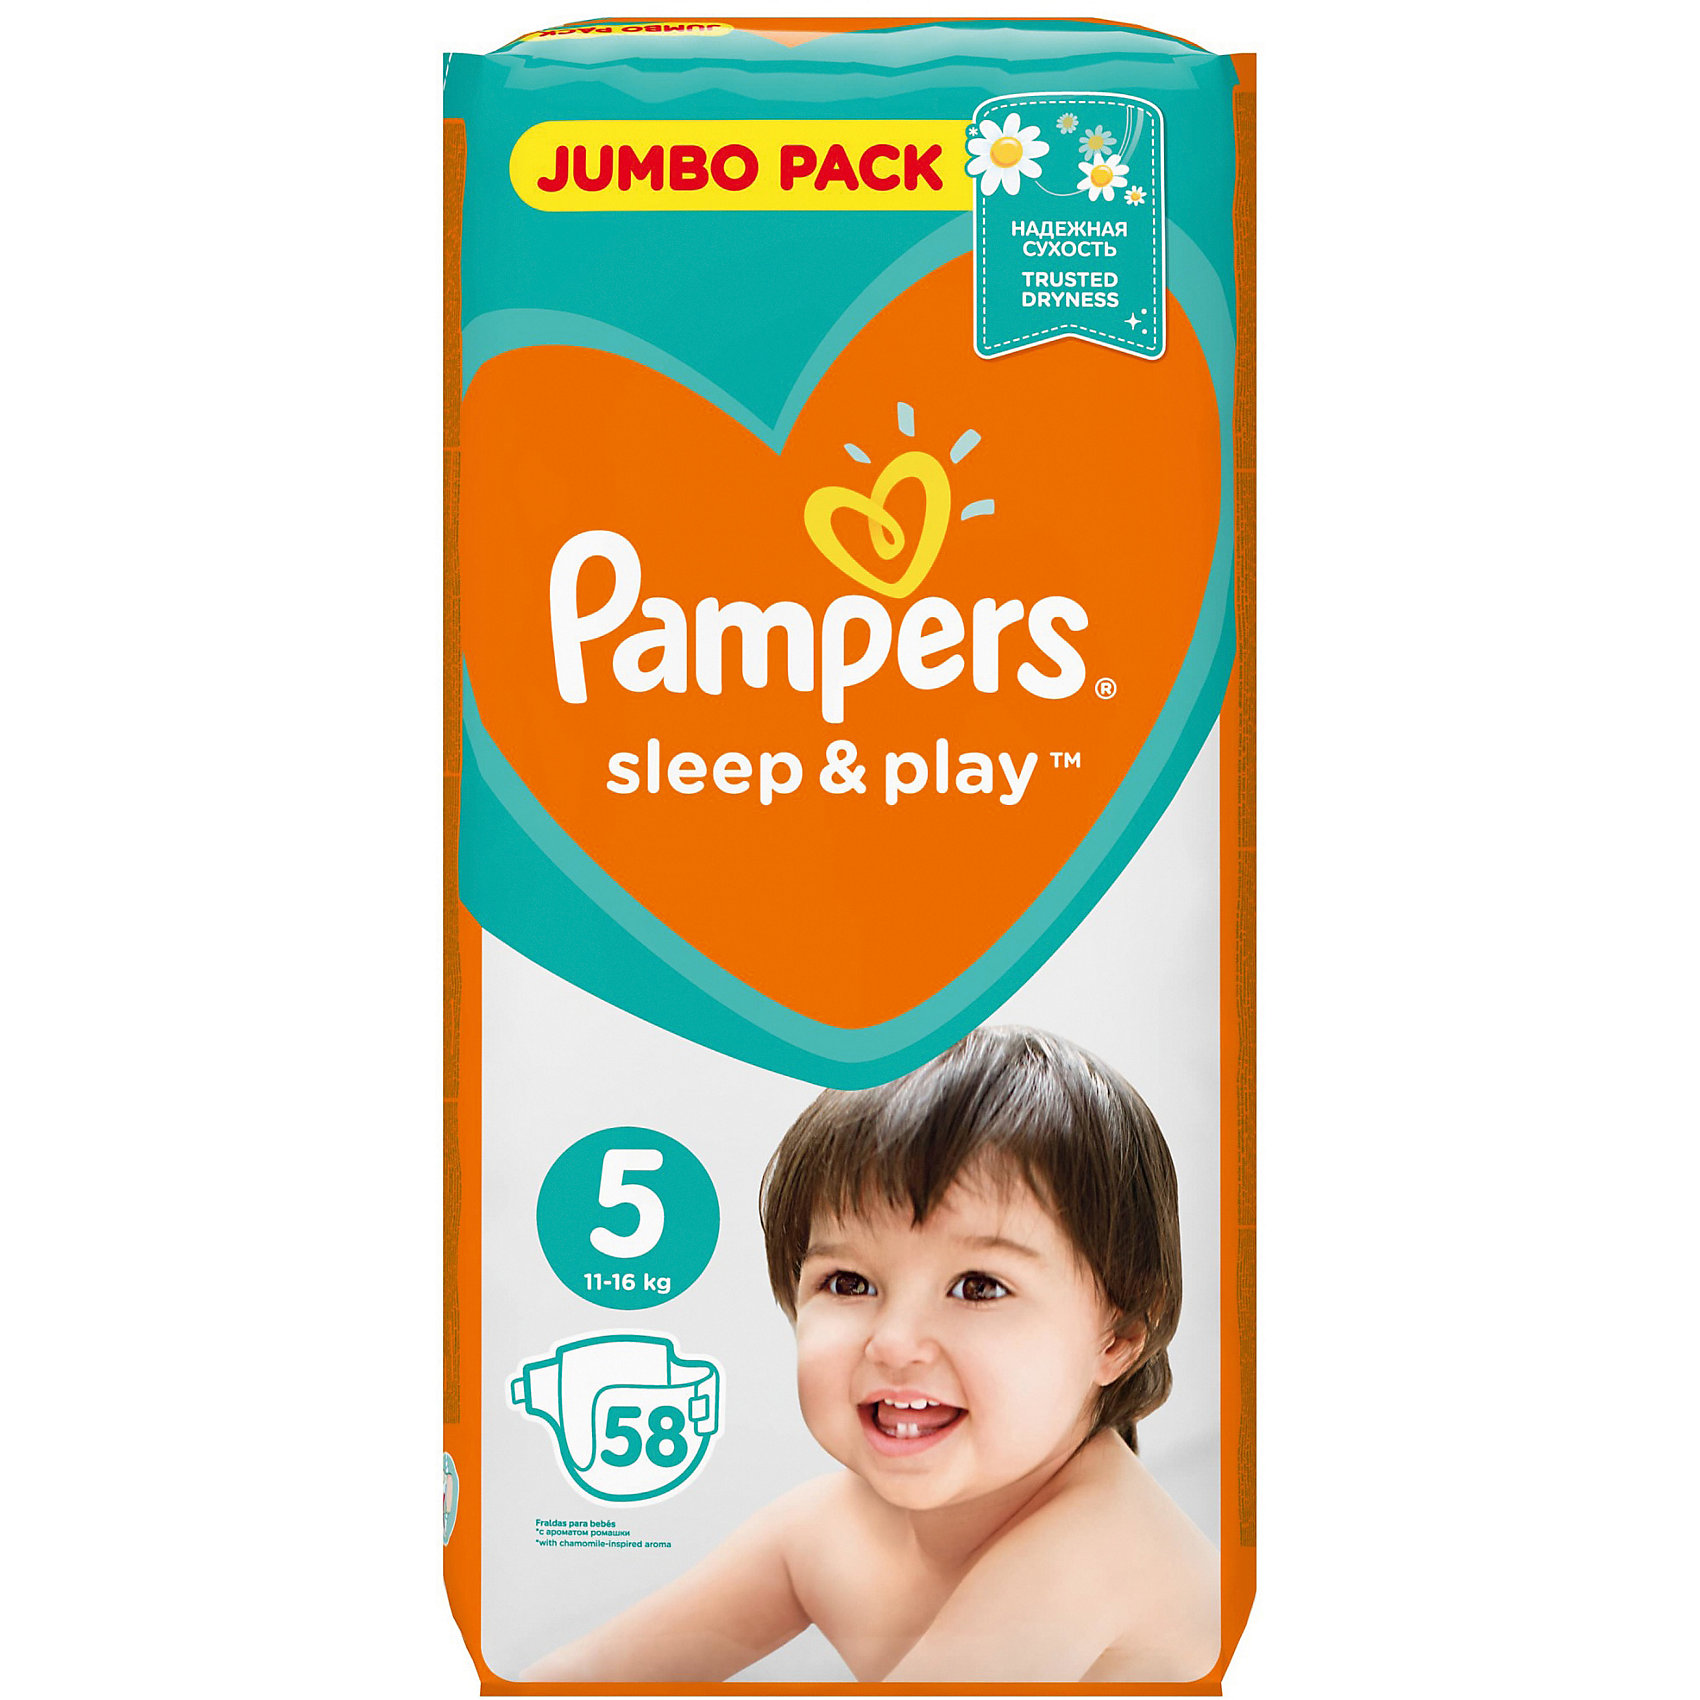 Подгузники Pampers Sleep &amp; Play Junior, 11-18 кг, 5 размер, Jumbo pack, 58 шт., PampersПодгузники классические<br><br><br>Ширина мм: 253<br>Глубина мм: 118<br>Высота мм: 441<br>Вес г: 1737<br>Возраст от месяцев: 12<br>Возраст до месяцев: 24<br>Пол: Унисекс<br>Возраст: Детский<br>SKU: 5516309